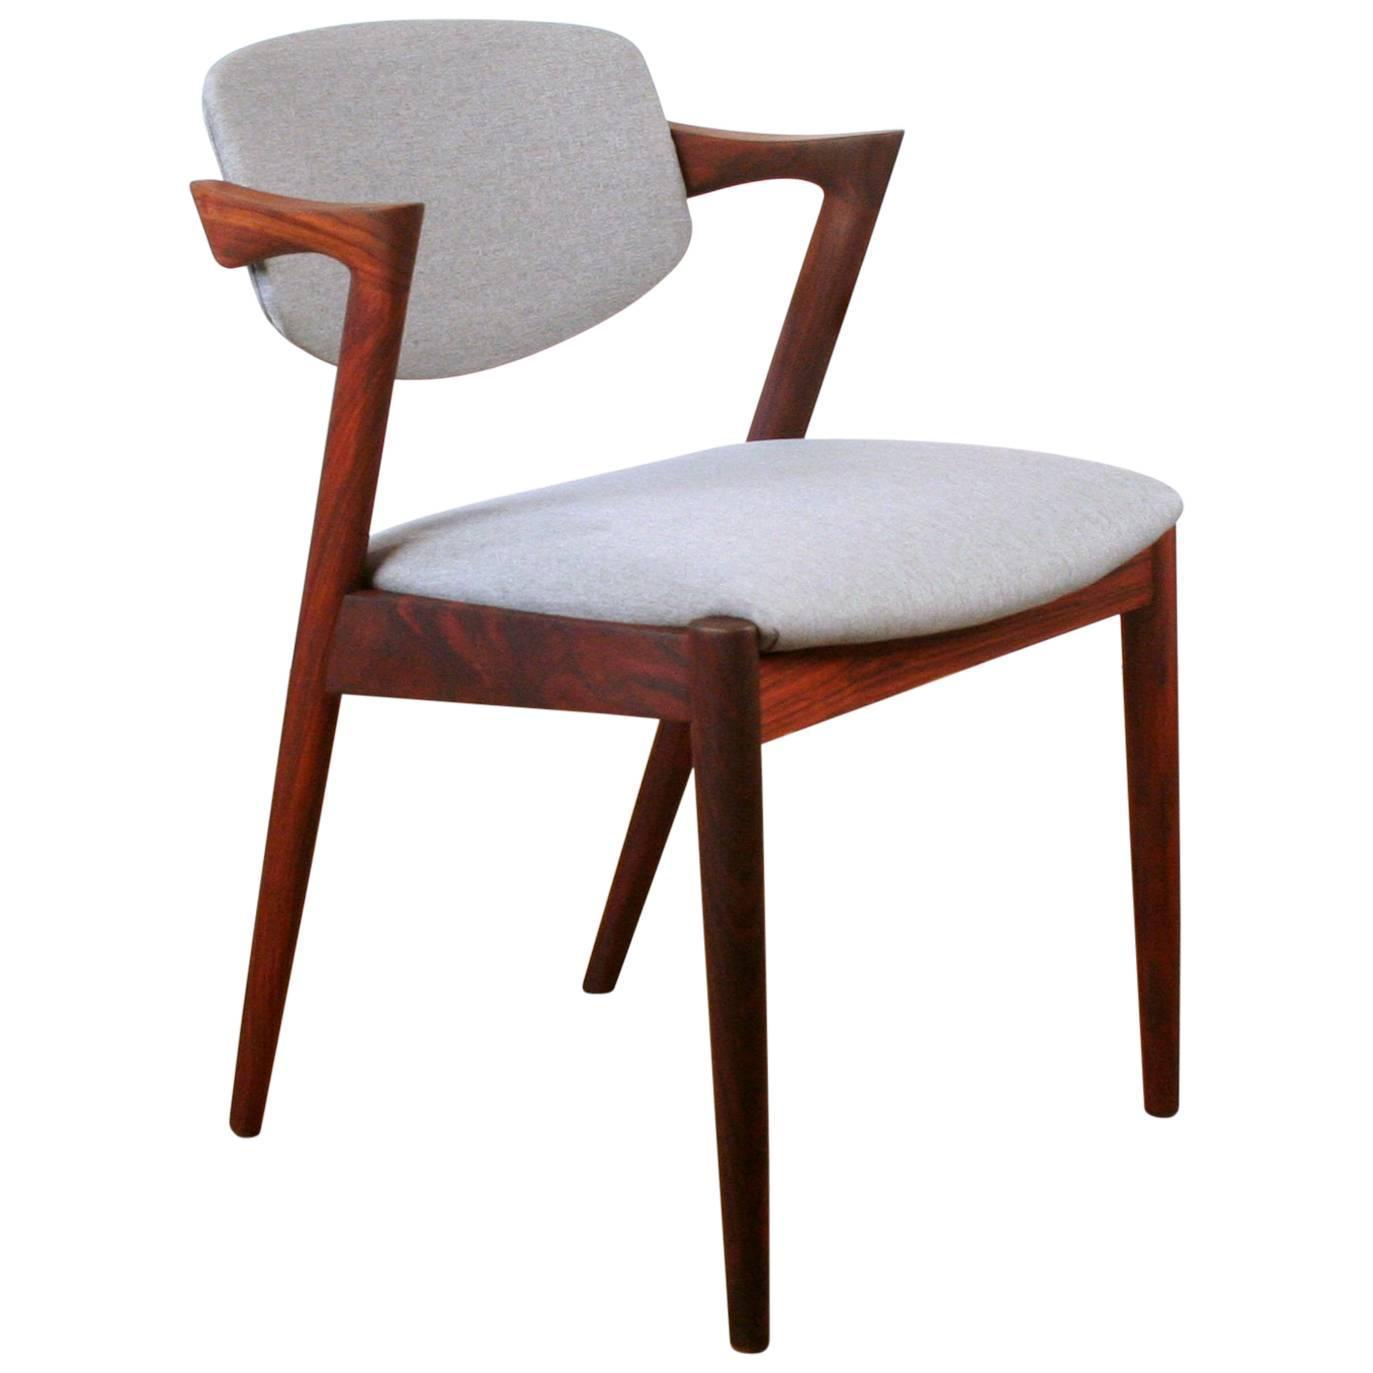 Kai kristiansen chairs best home design 2018 - Kai kristiansen chair ...